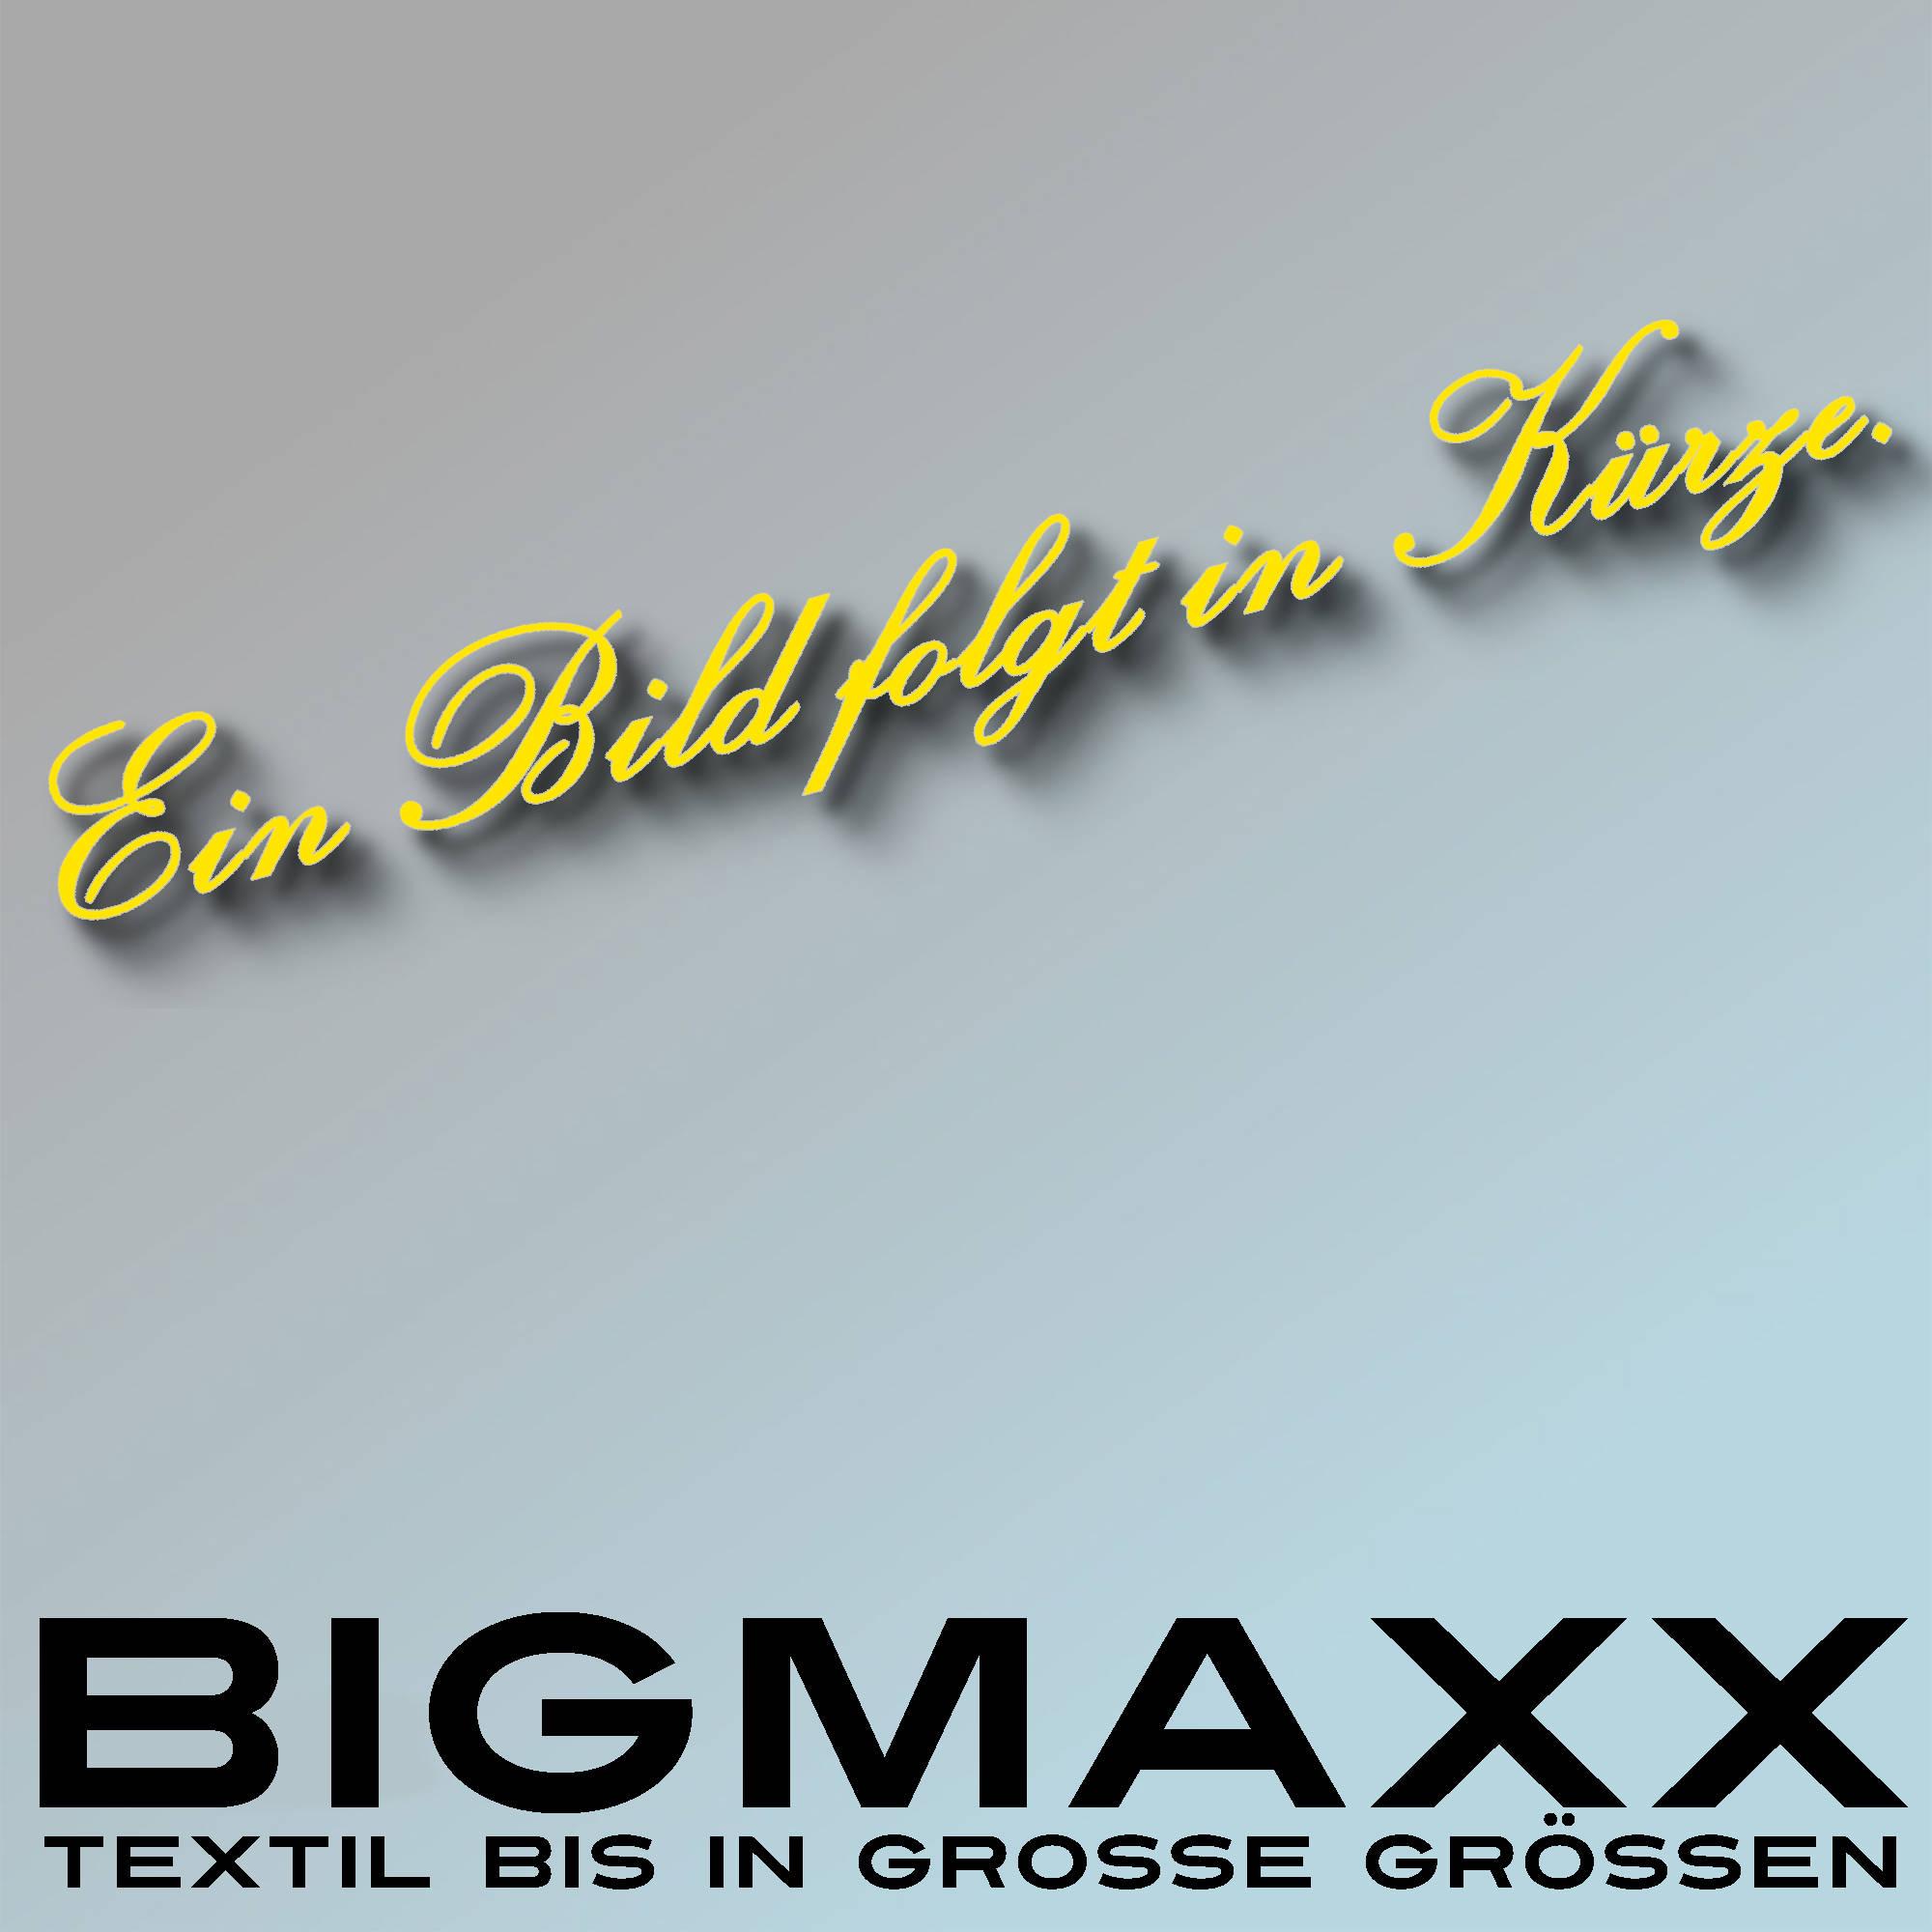 4PROtect Softshell-Jacke OHIO Arbeitsjacke Workwear in drei Farben Gr S bis 4XL